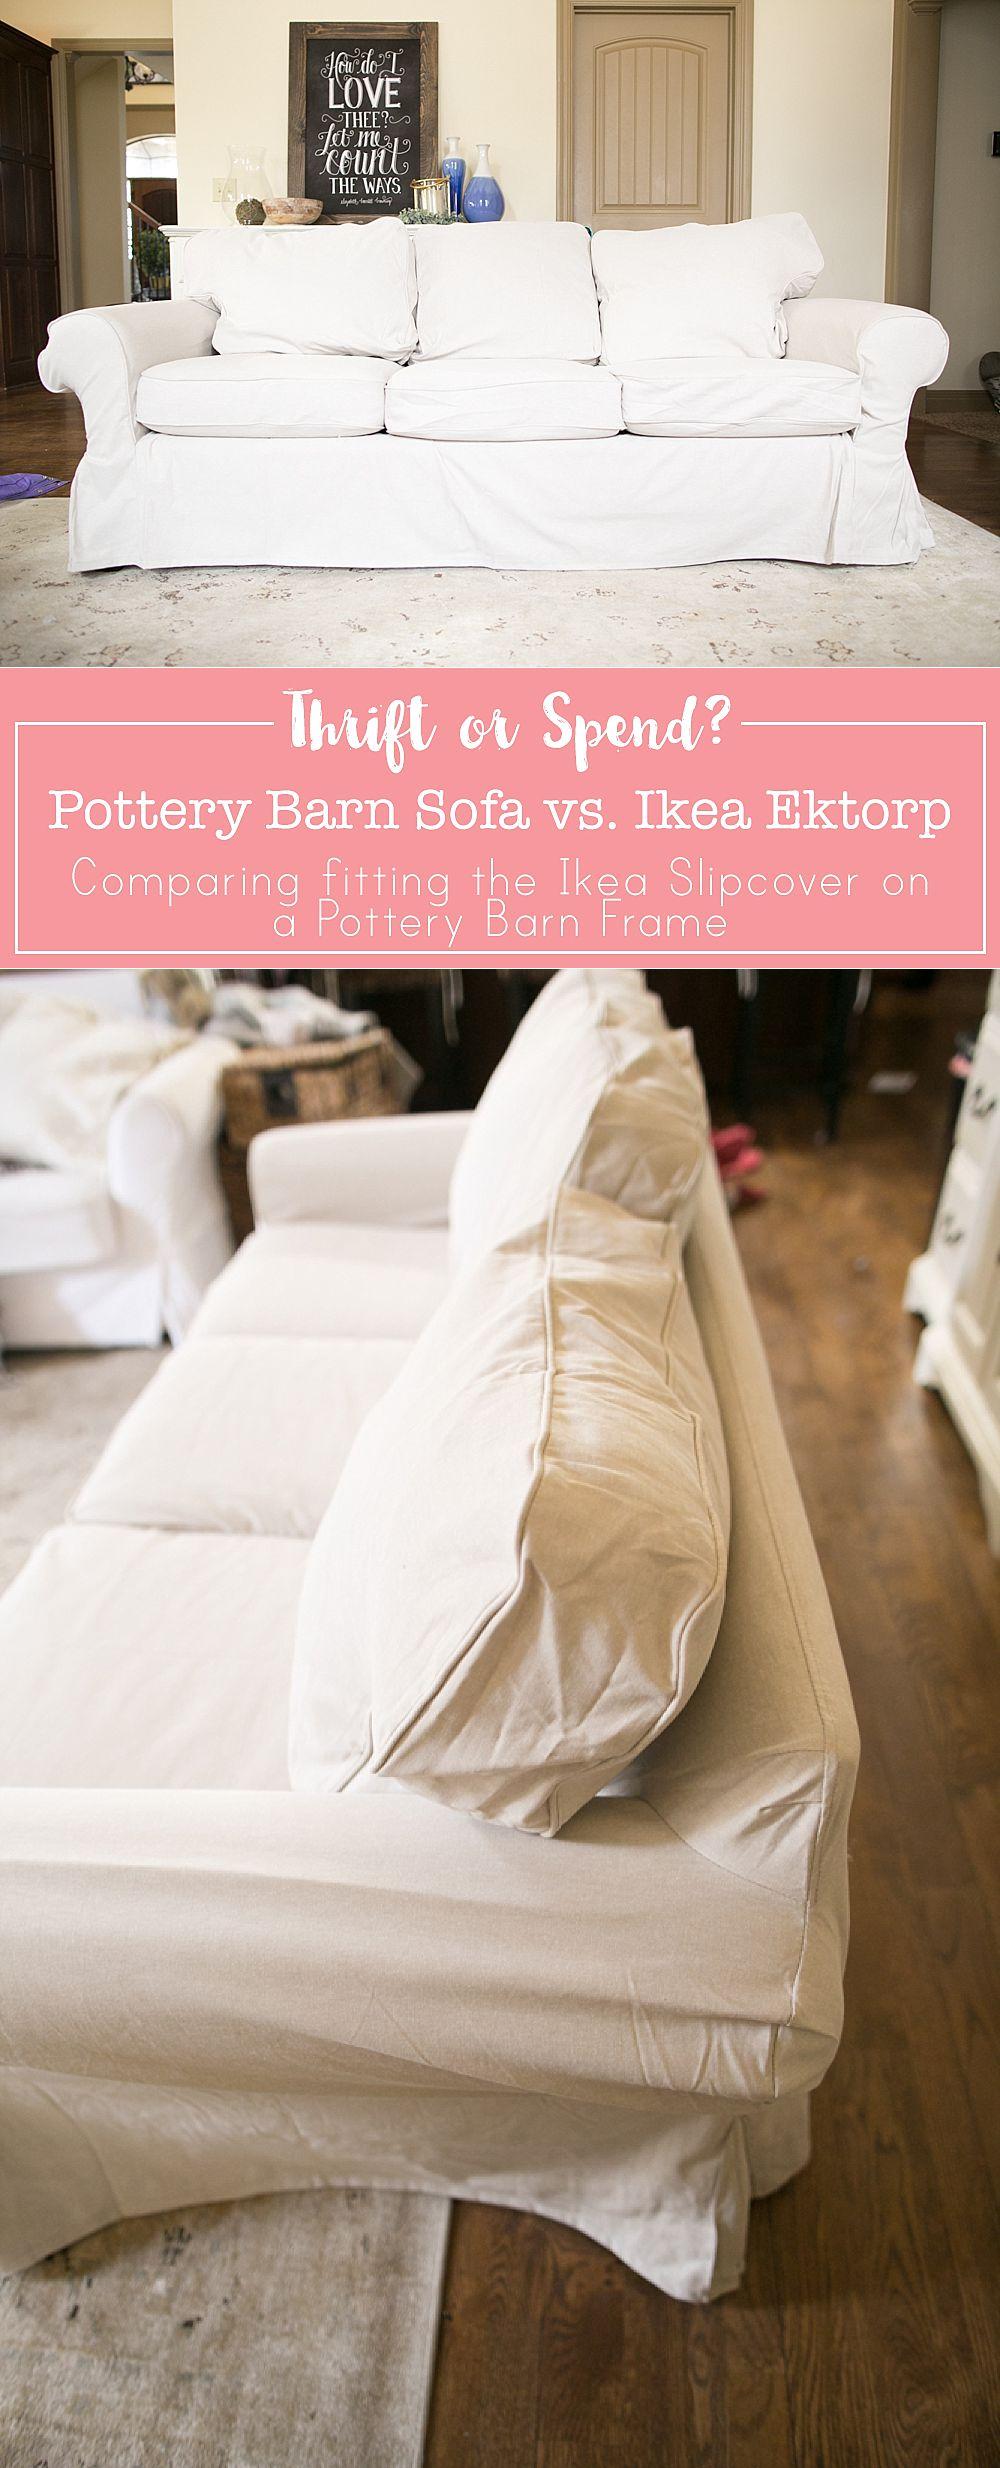 Ektorp Sofa Cover on a Pottery Barn Basic Sofa featured by top US lifestyle blogger, Sengerson: ikea slipcovers for non ikea furniture - save money not having to buy Pottery Barn Slipcovers for your sofa